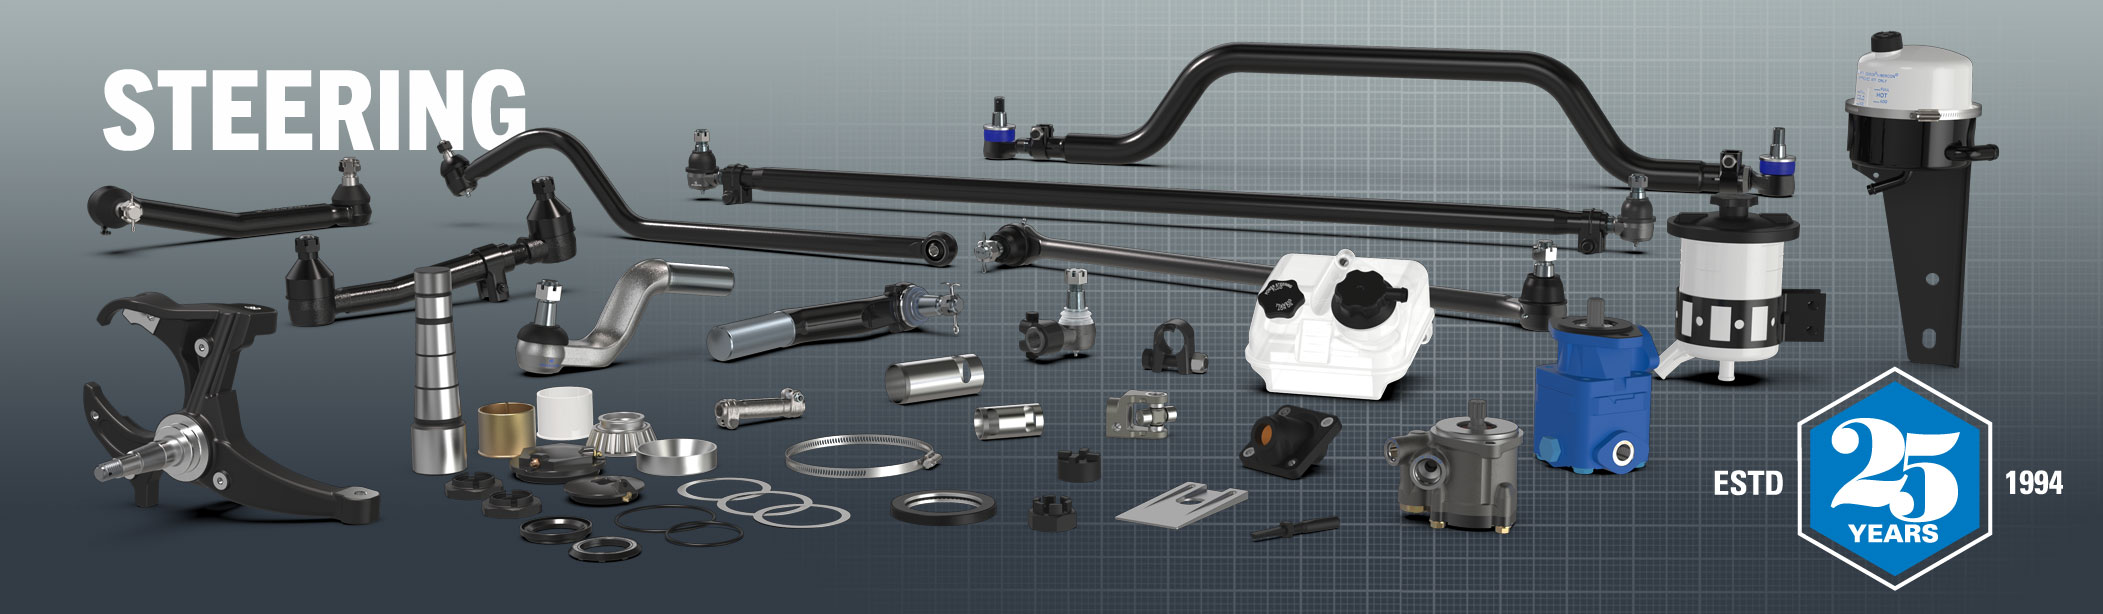 Products - Automann USA, Inc